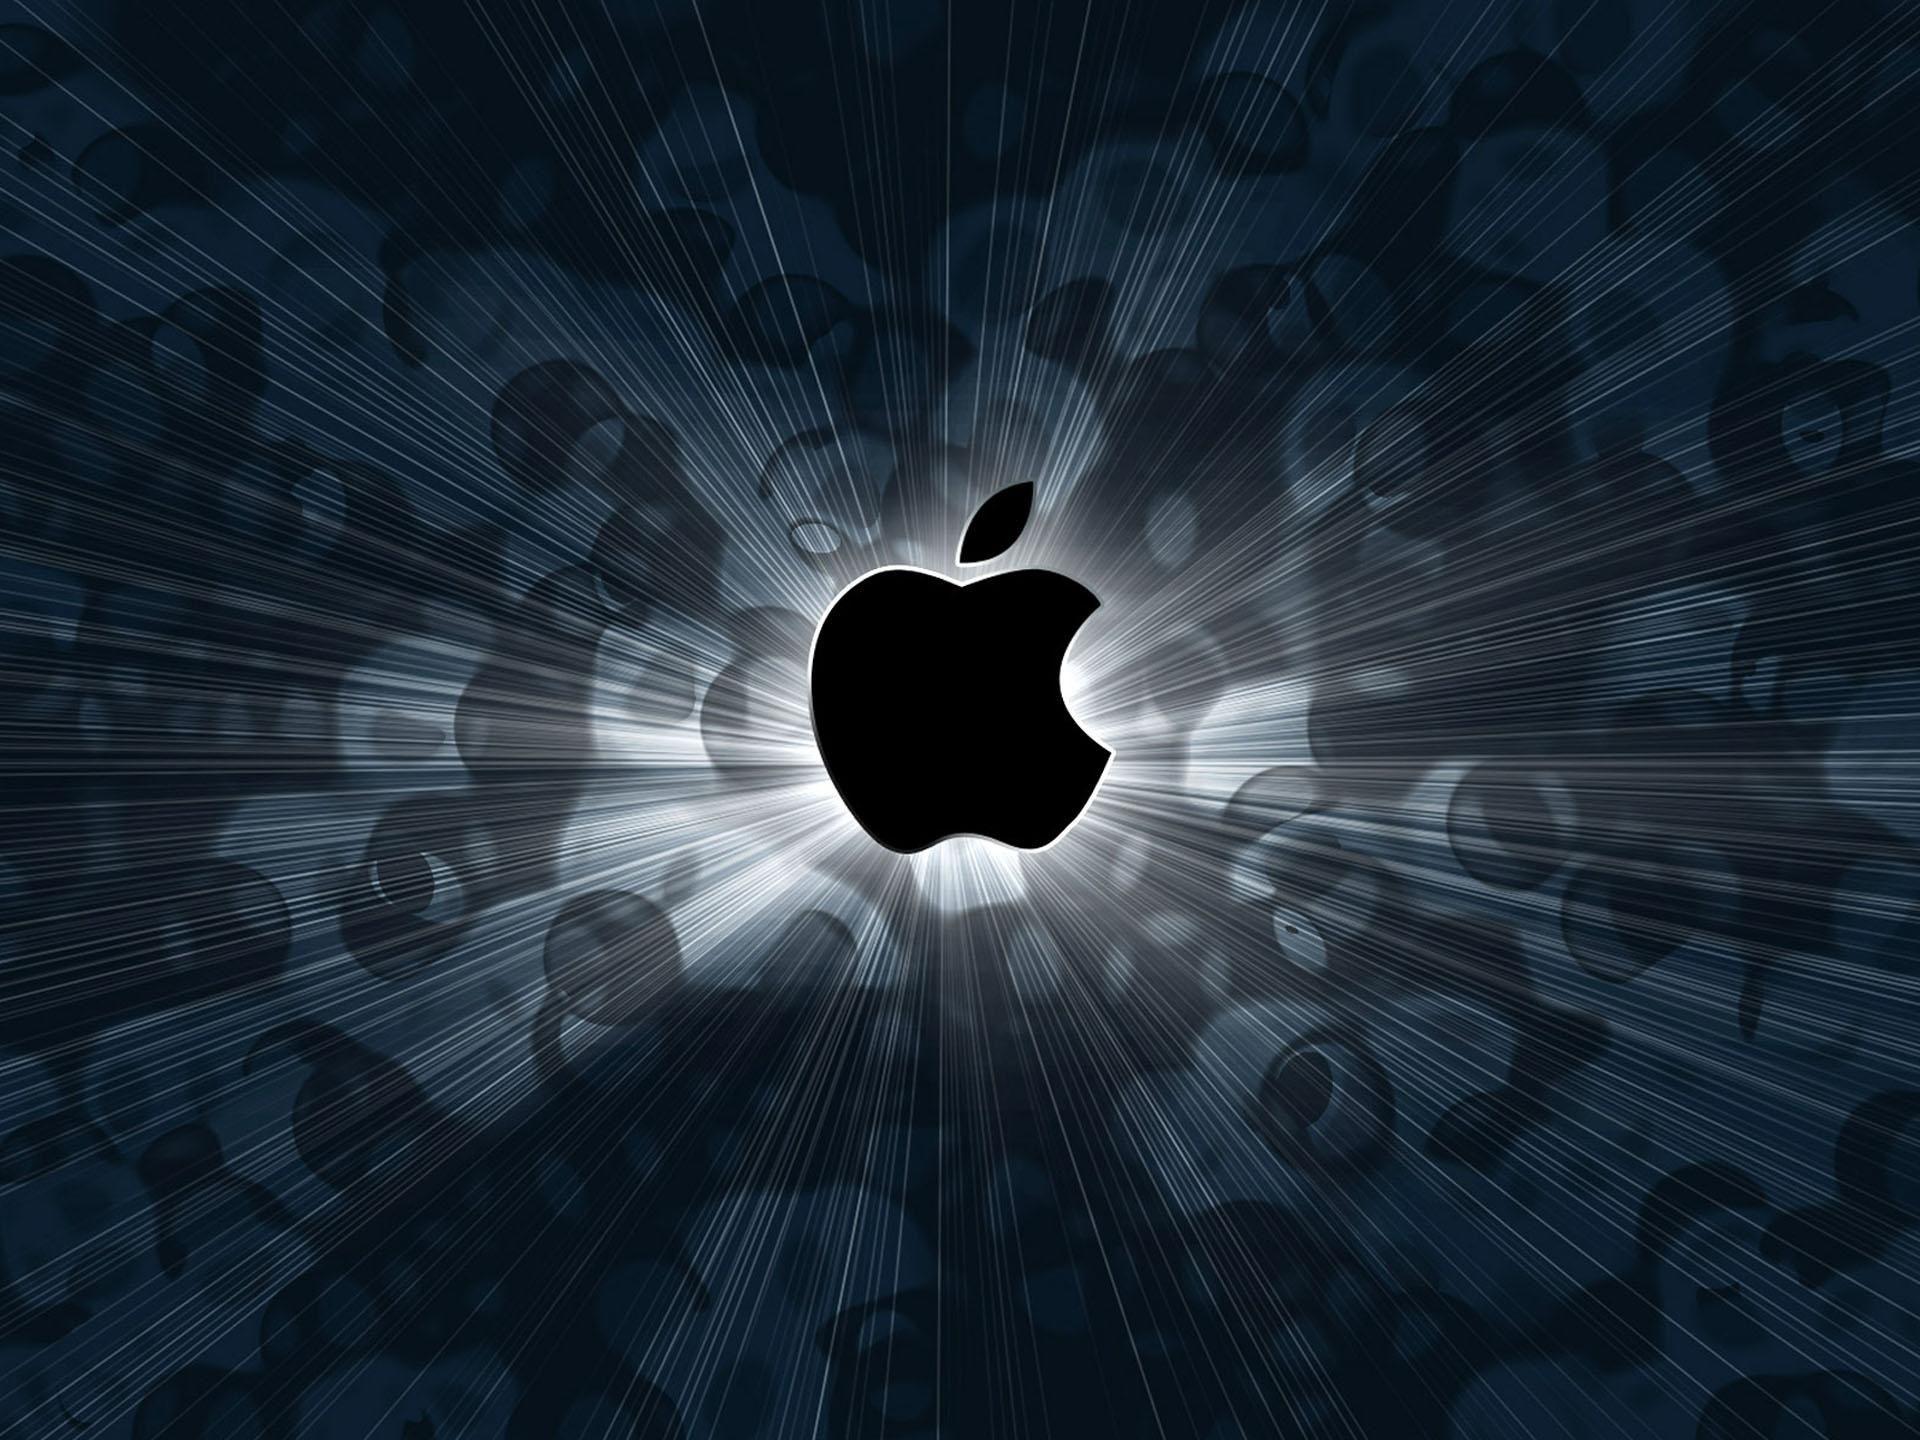 Apple Logo Wallpapers Background Scrapbook Pinterest Logos